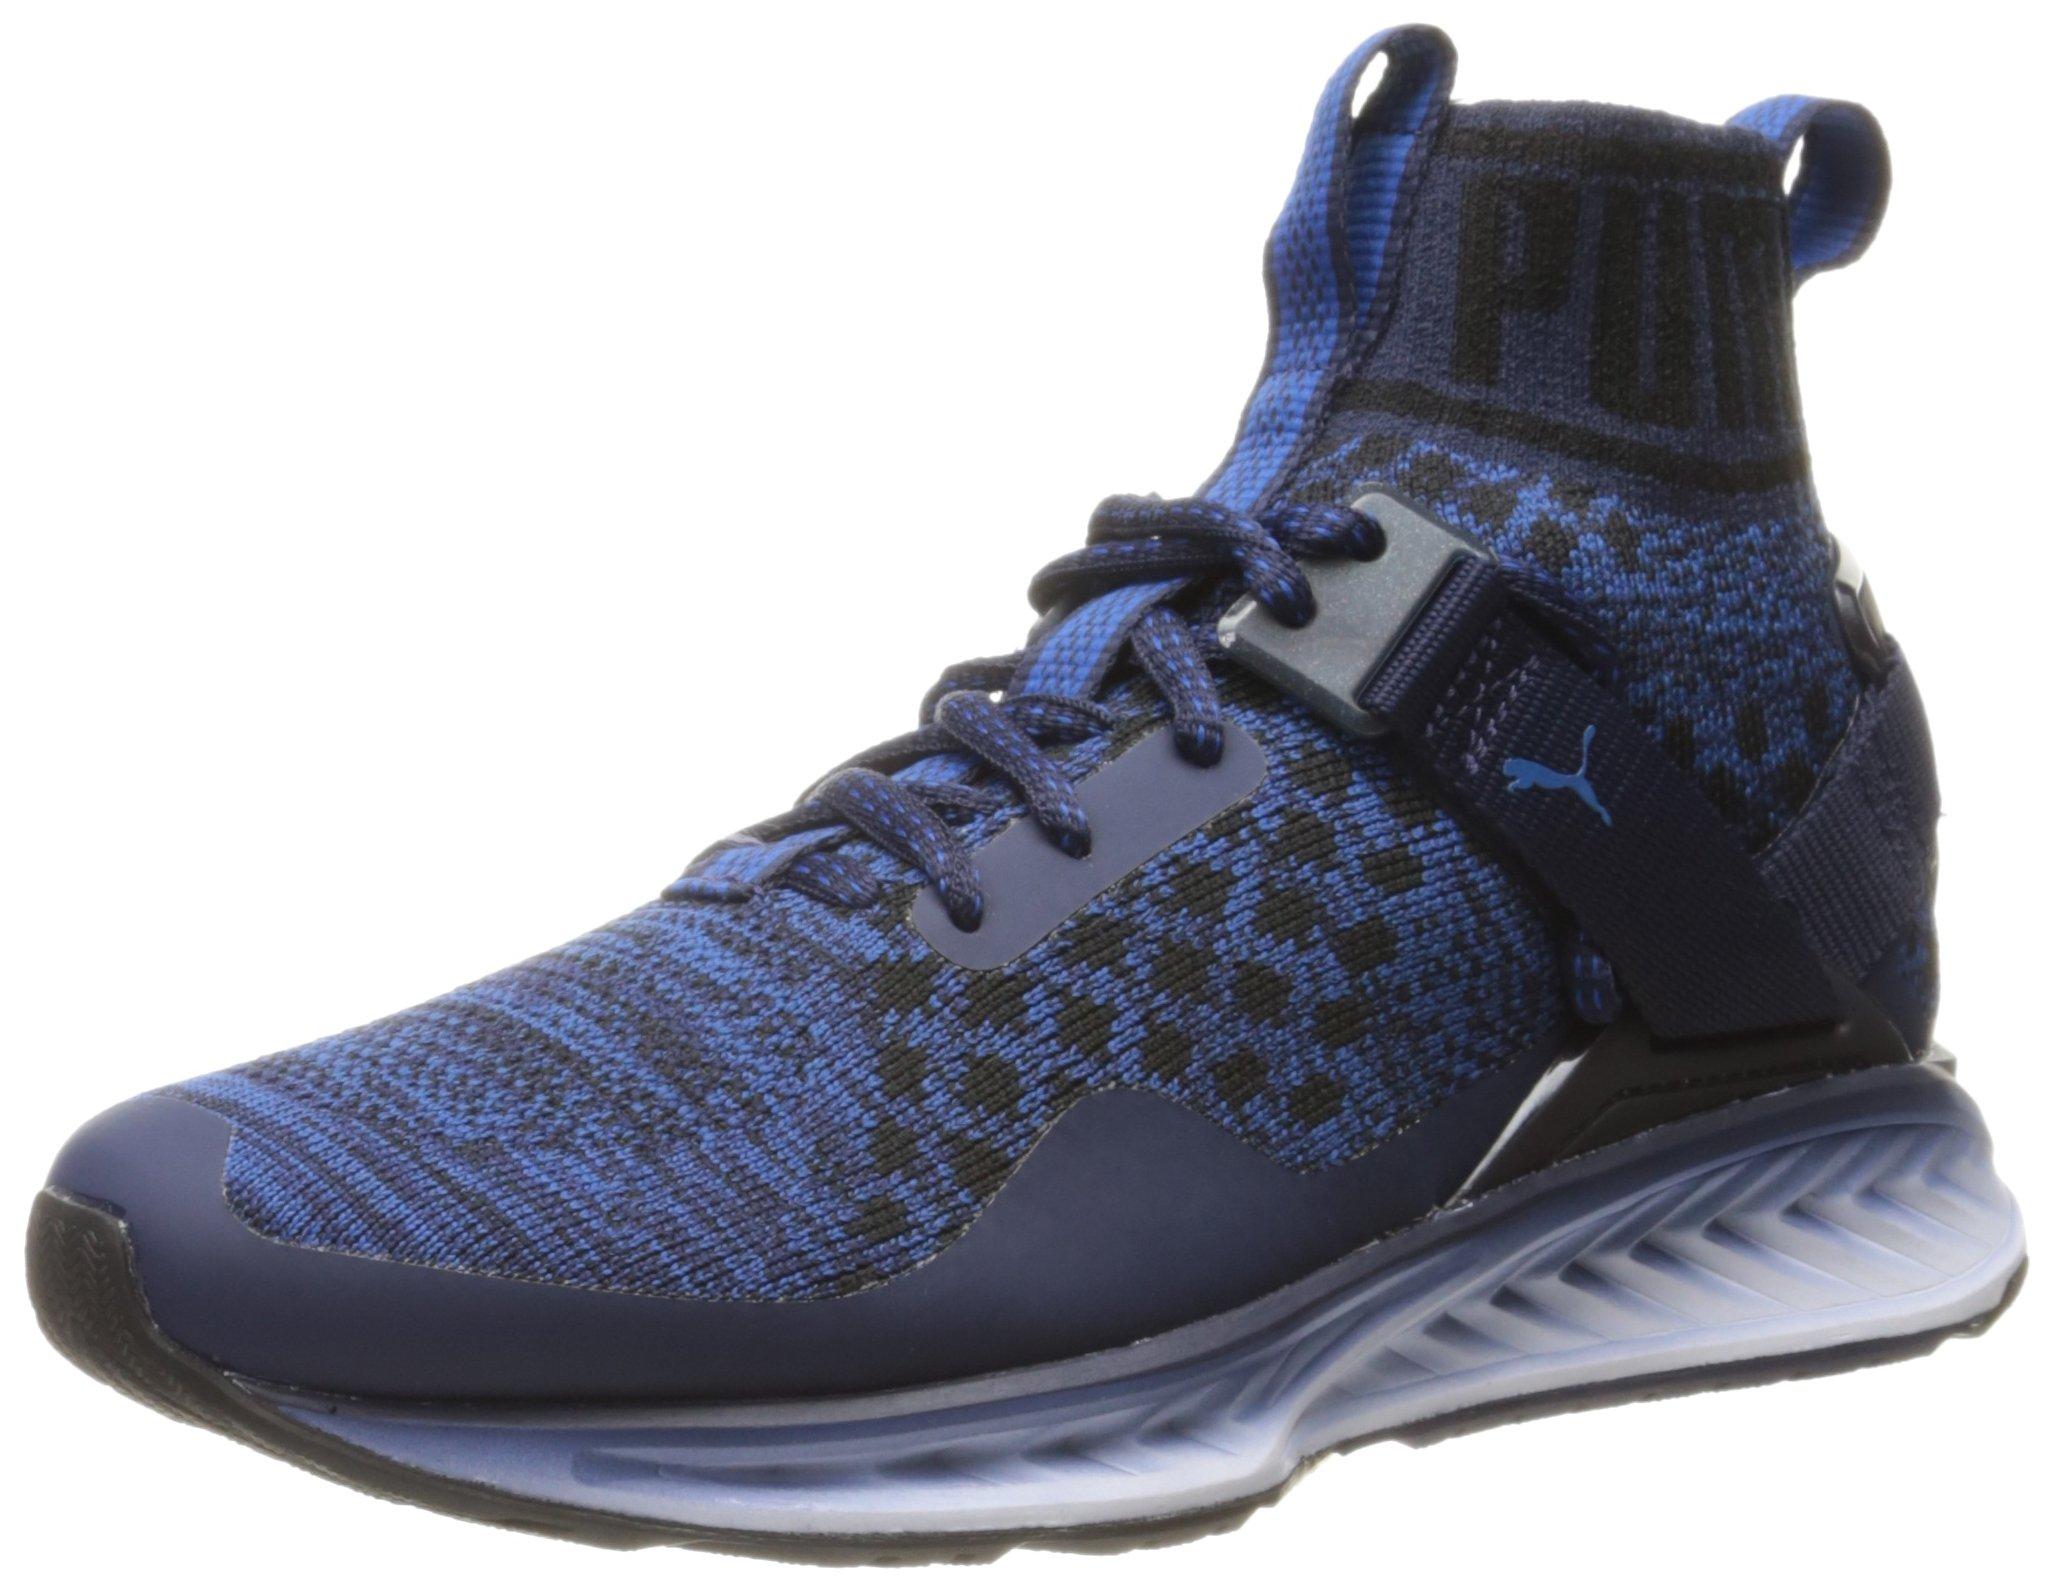 PUMA Men's Ignite Evoknit Fade Cross-Trainer Shoe, Peacoat Black/True Blue, 6 M US